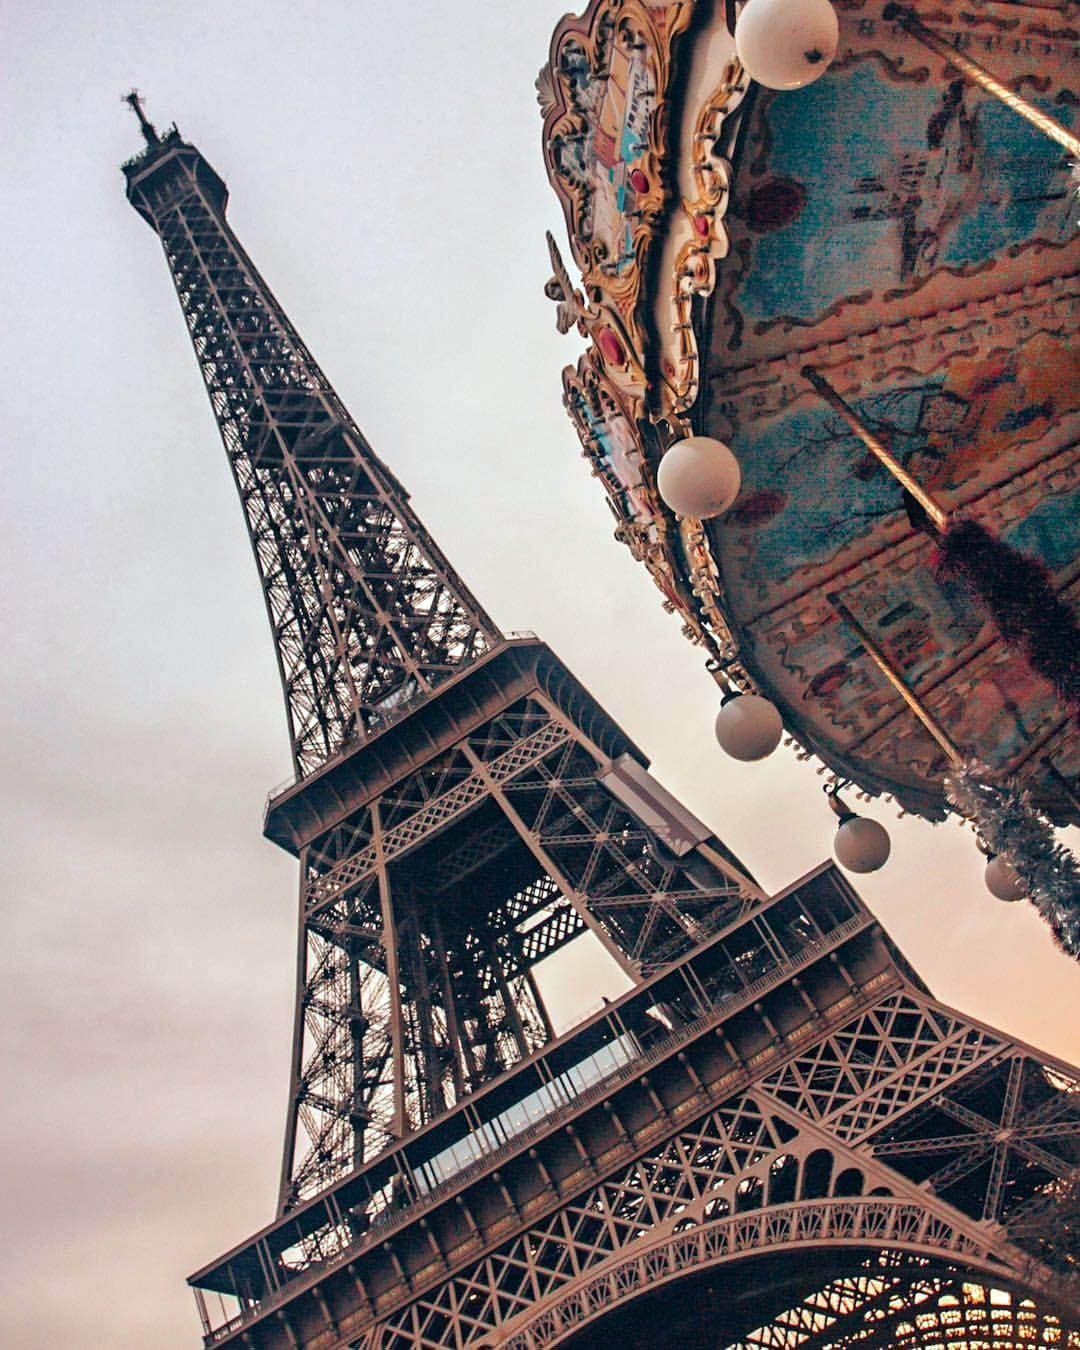 Eiffel tower color. Top secrets of the